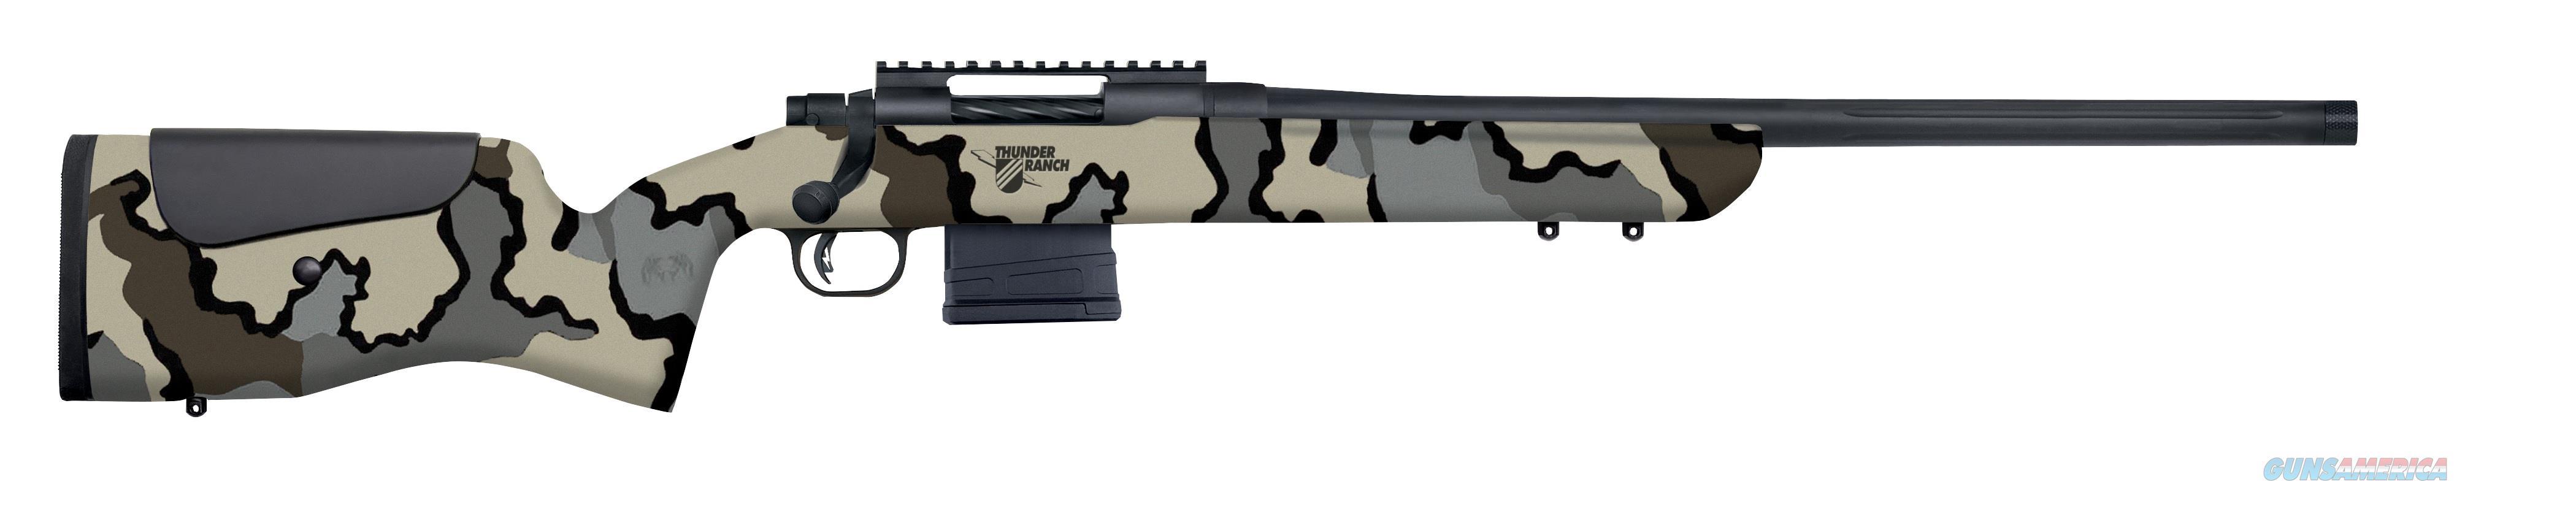 "Mossberg MVP LR Thunder Ranch 7.62 NATO 20"" Kuiu Camo 28041  Guns > Rifles > Mossberg Rifles > MVP"